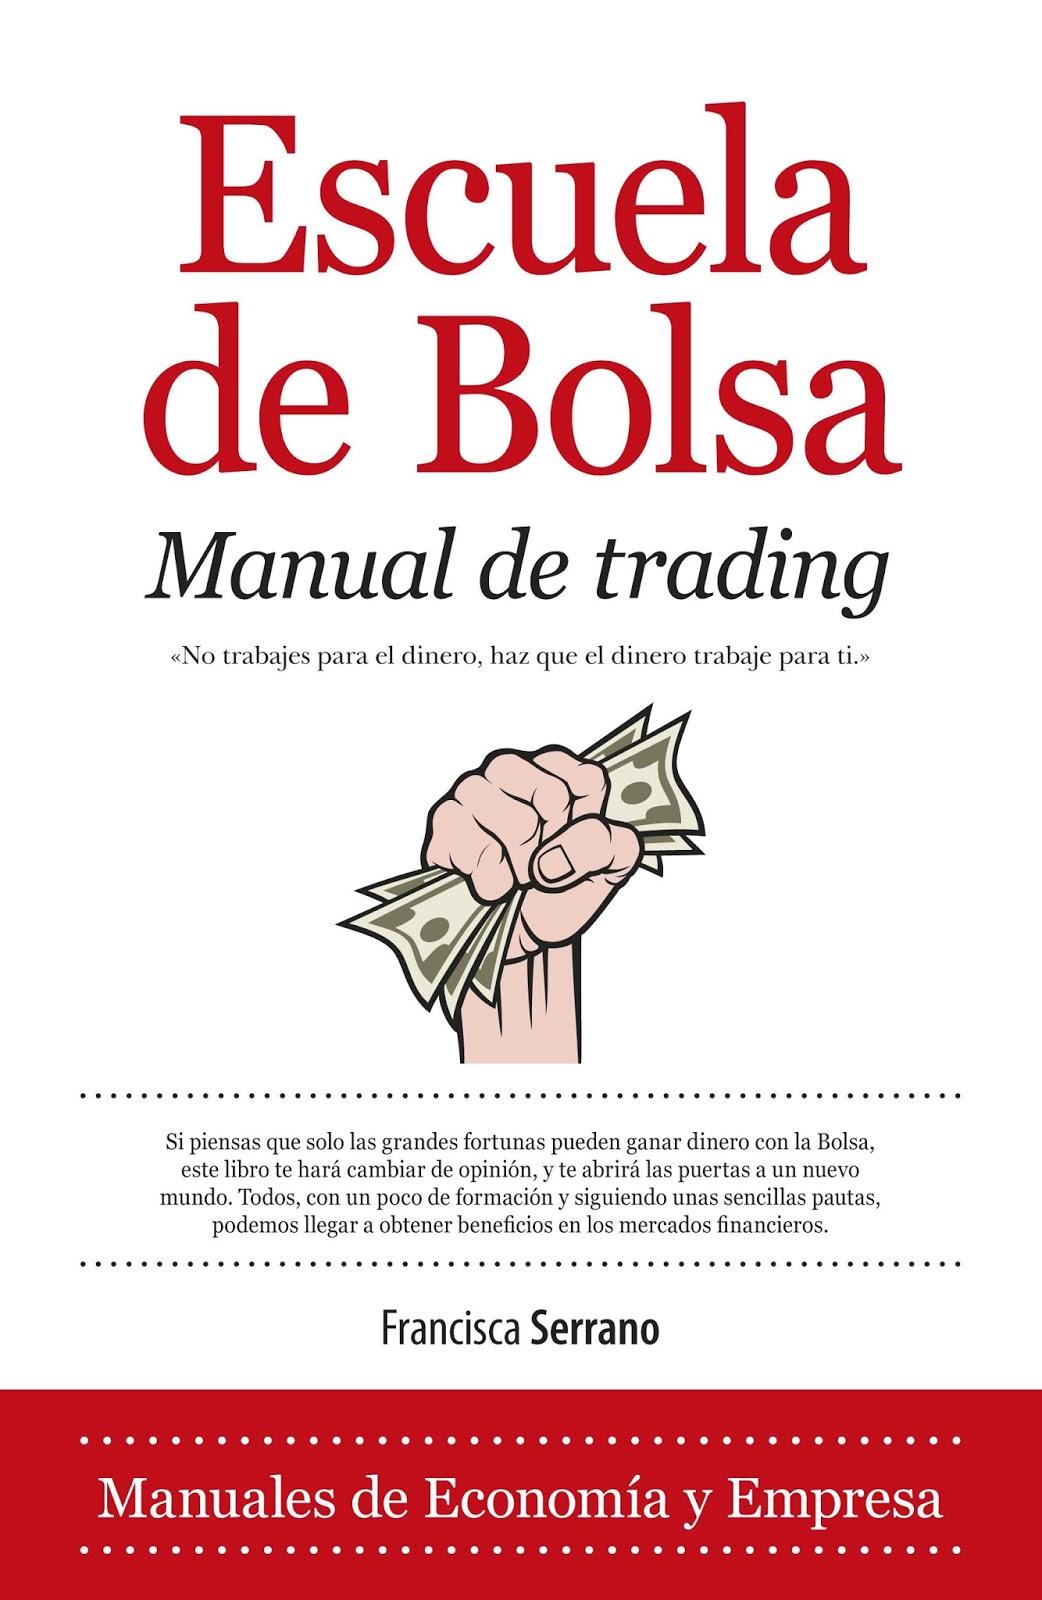 Escuela de bolsa. Manual de trading. Francisca Serrano